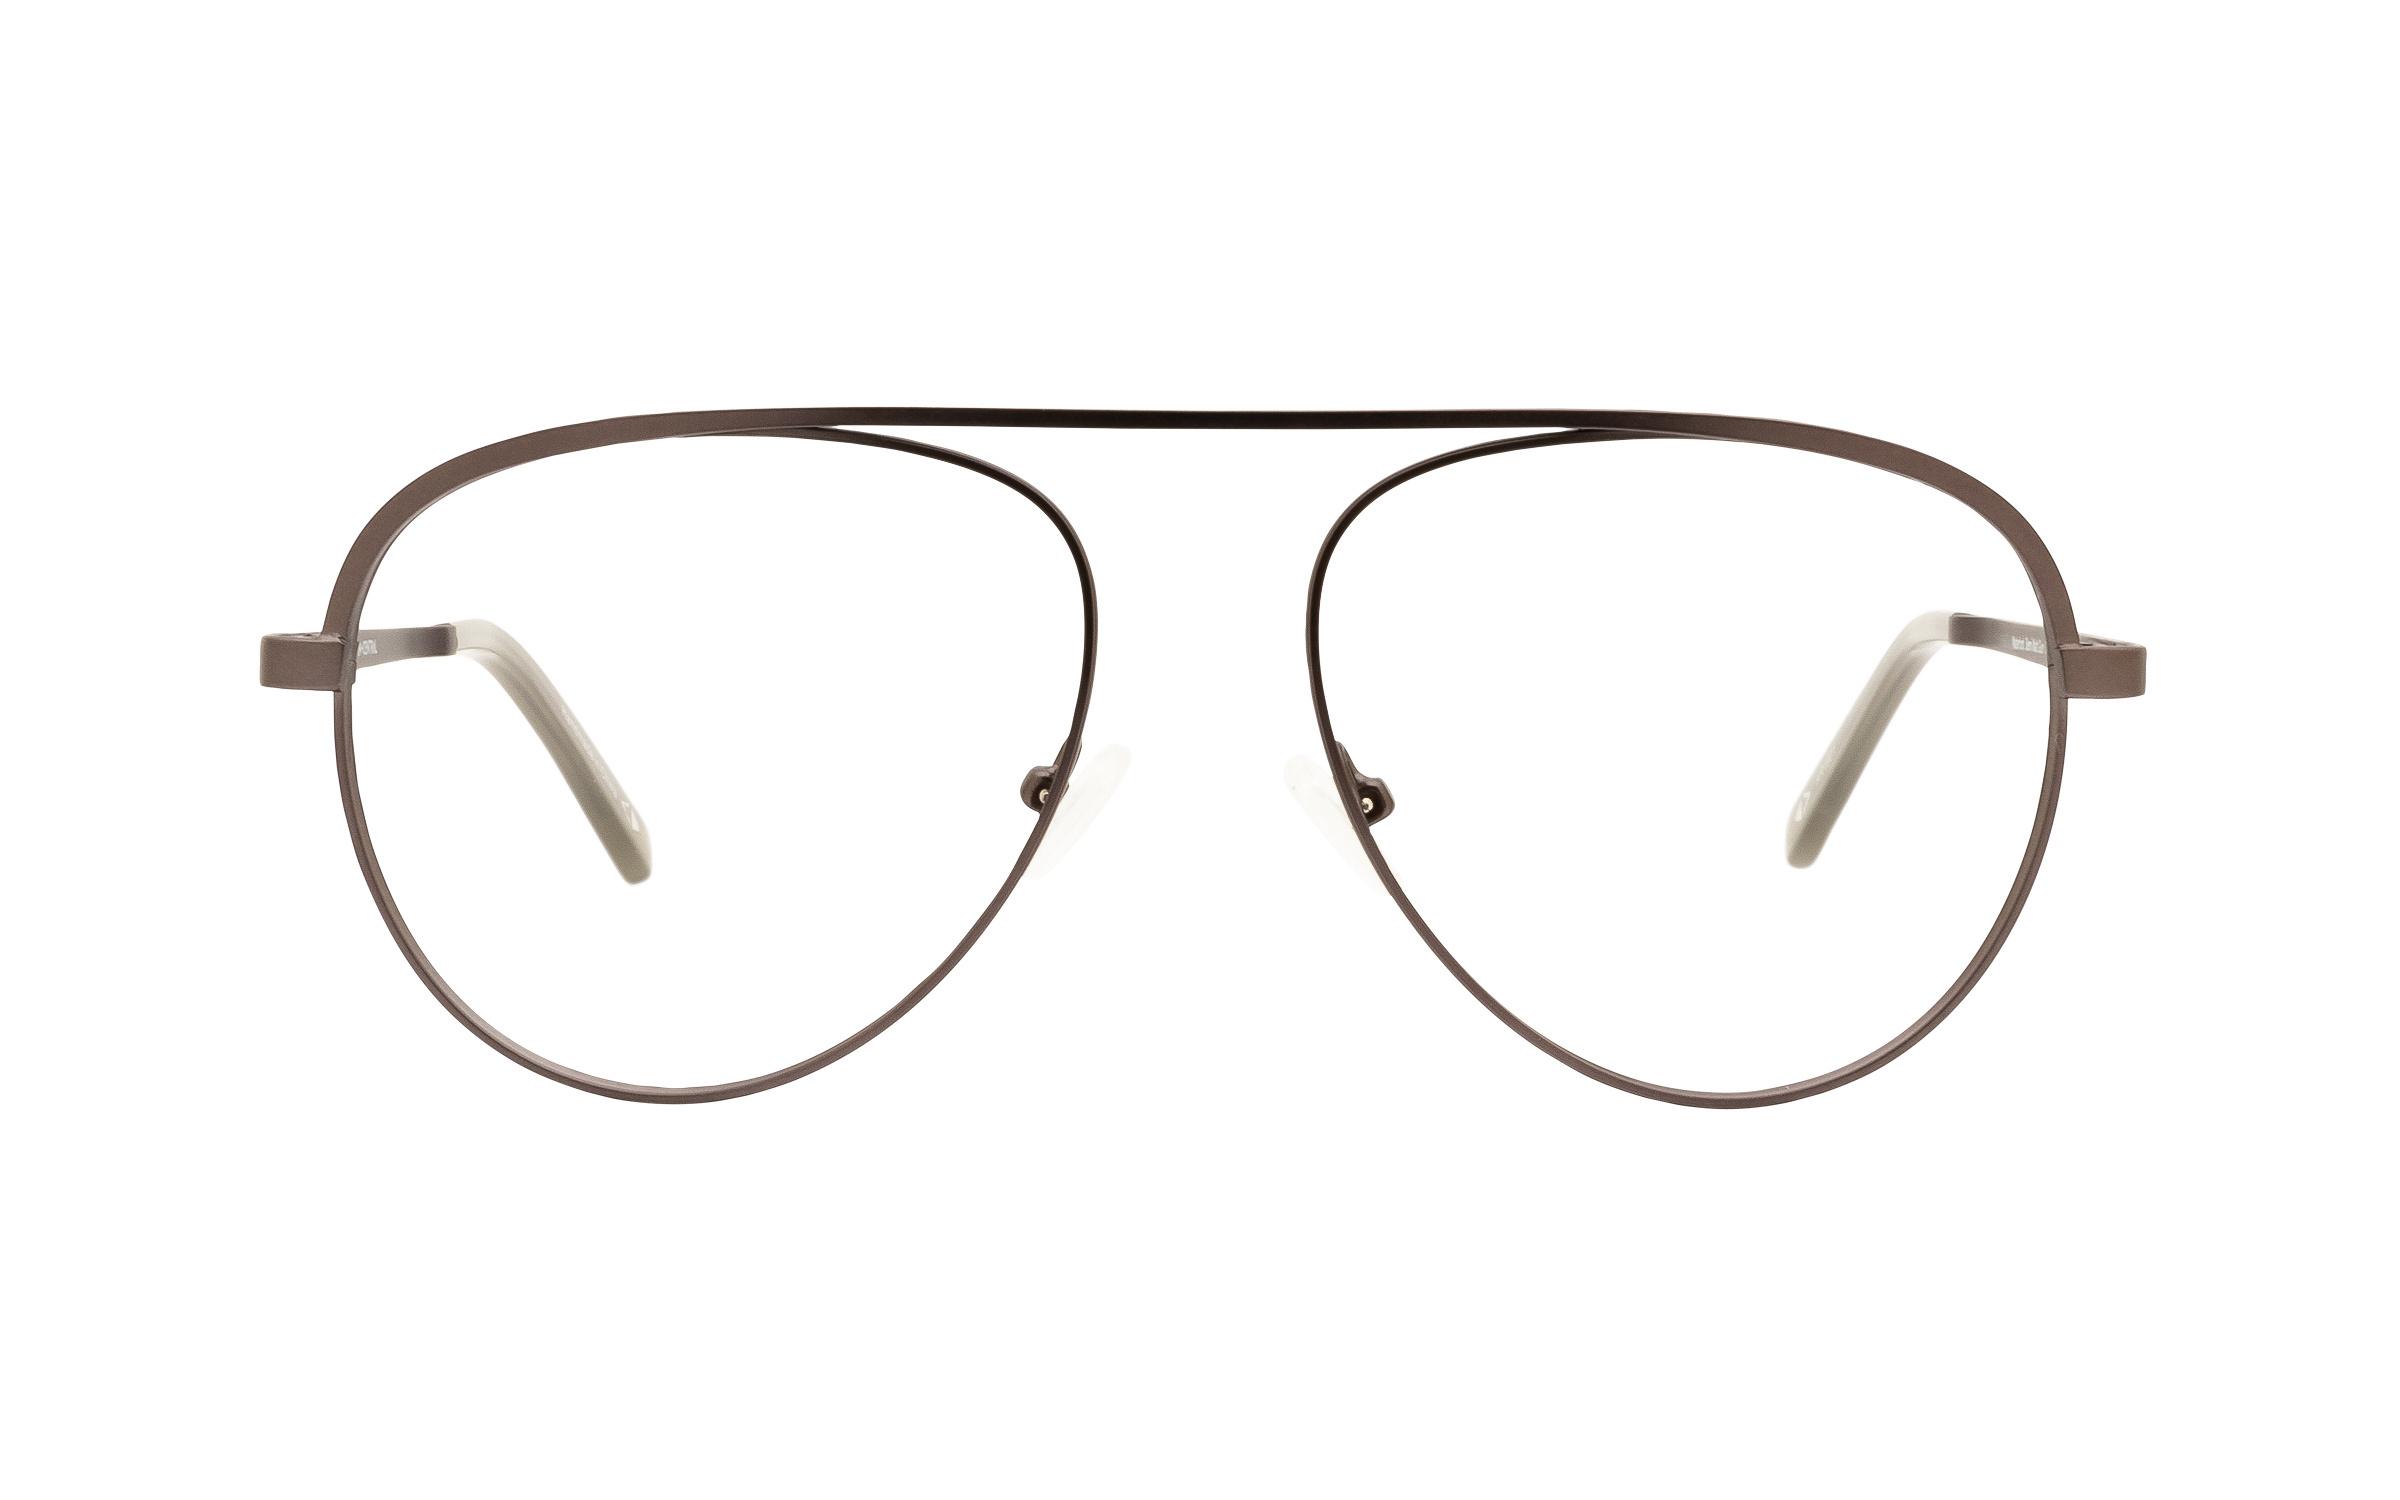 Main and Central Waterford MC130 C03 Semi Matt Gun (54) Eyeglasses and Frame in Grey | Metal - Online Coastal